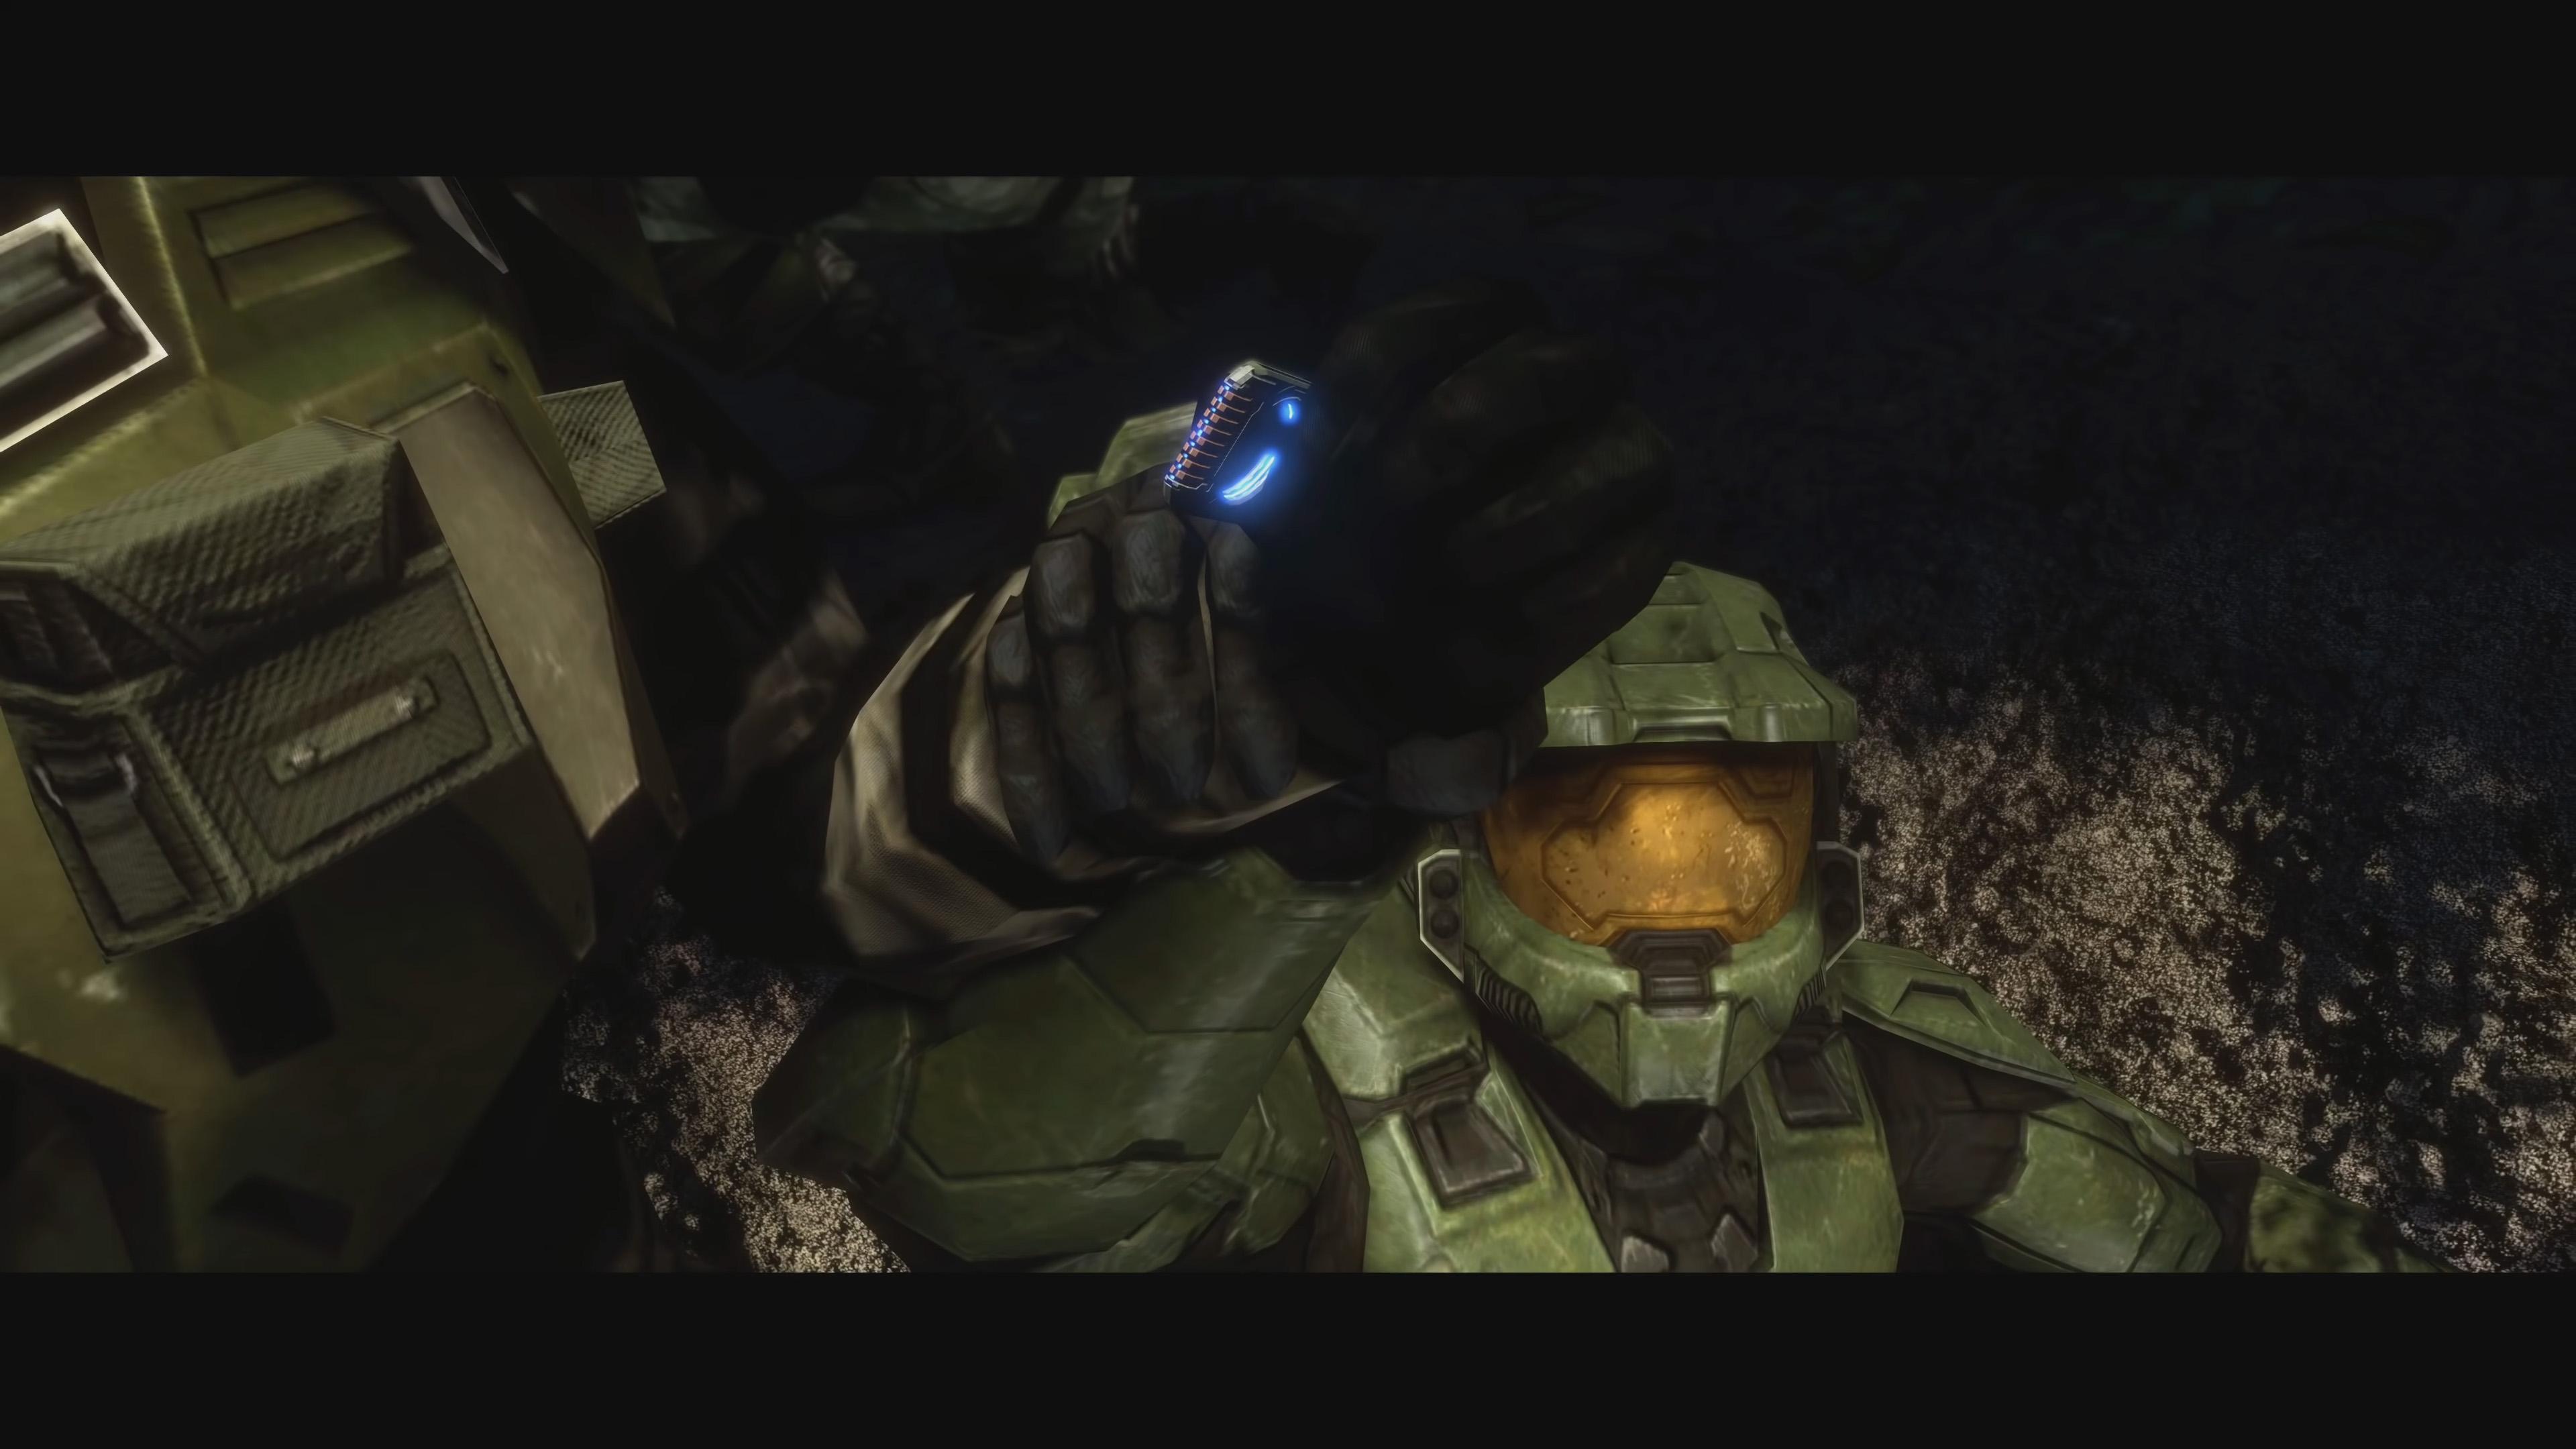 Halo 3 sierra 117 cutscene